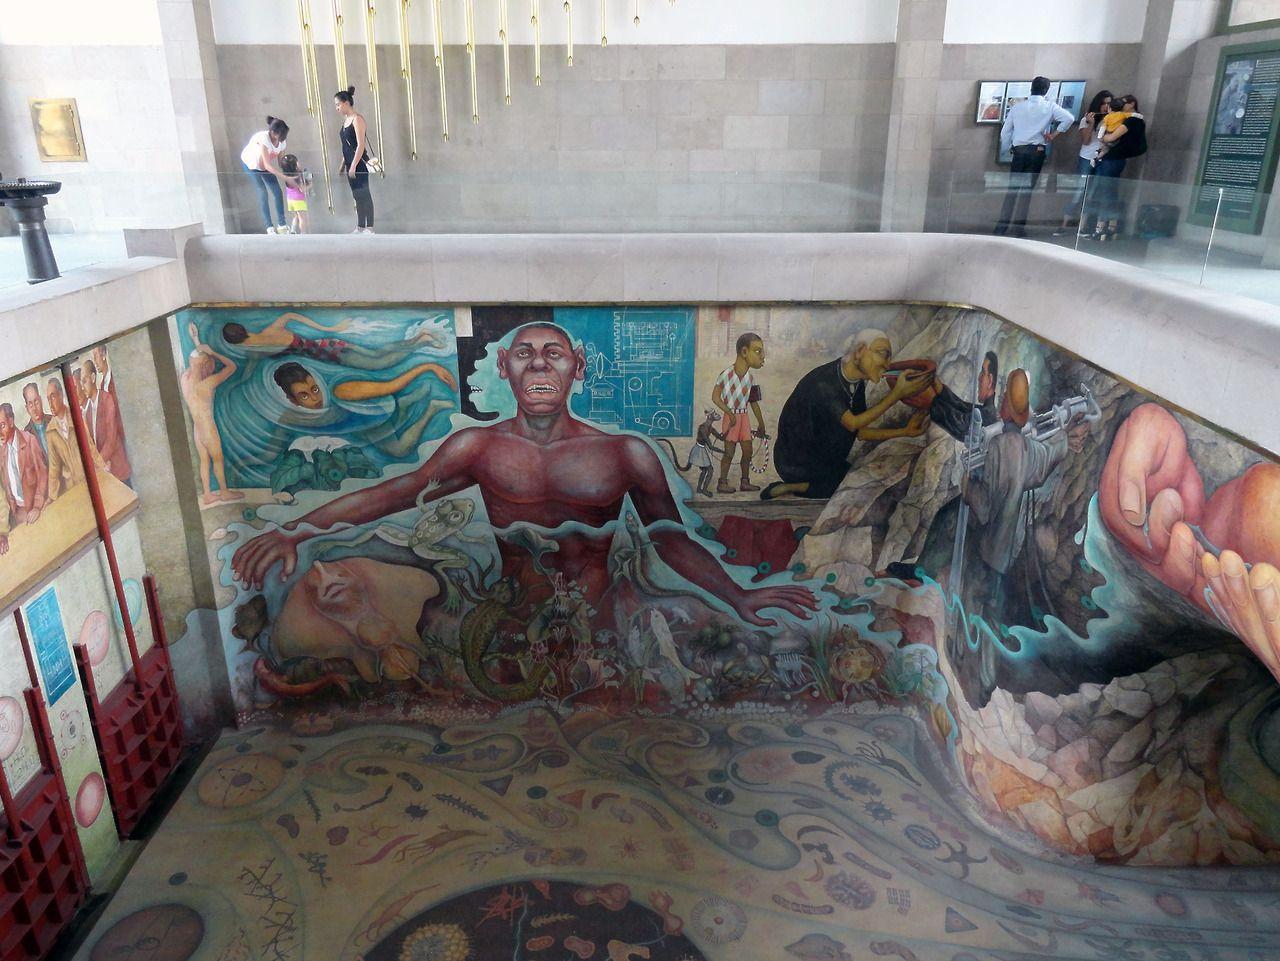 Clauvers Mural El Agua Origen De La Vida De Diego Rivera Carcamo De Dolores Bosque De Chapultepec Water Origin Of Creative Art Diego Rivera Painting